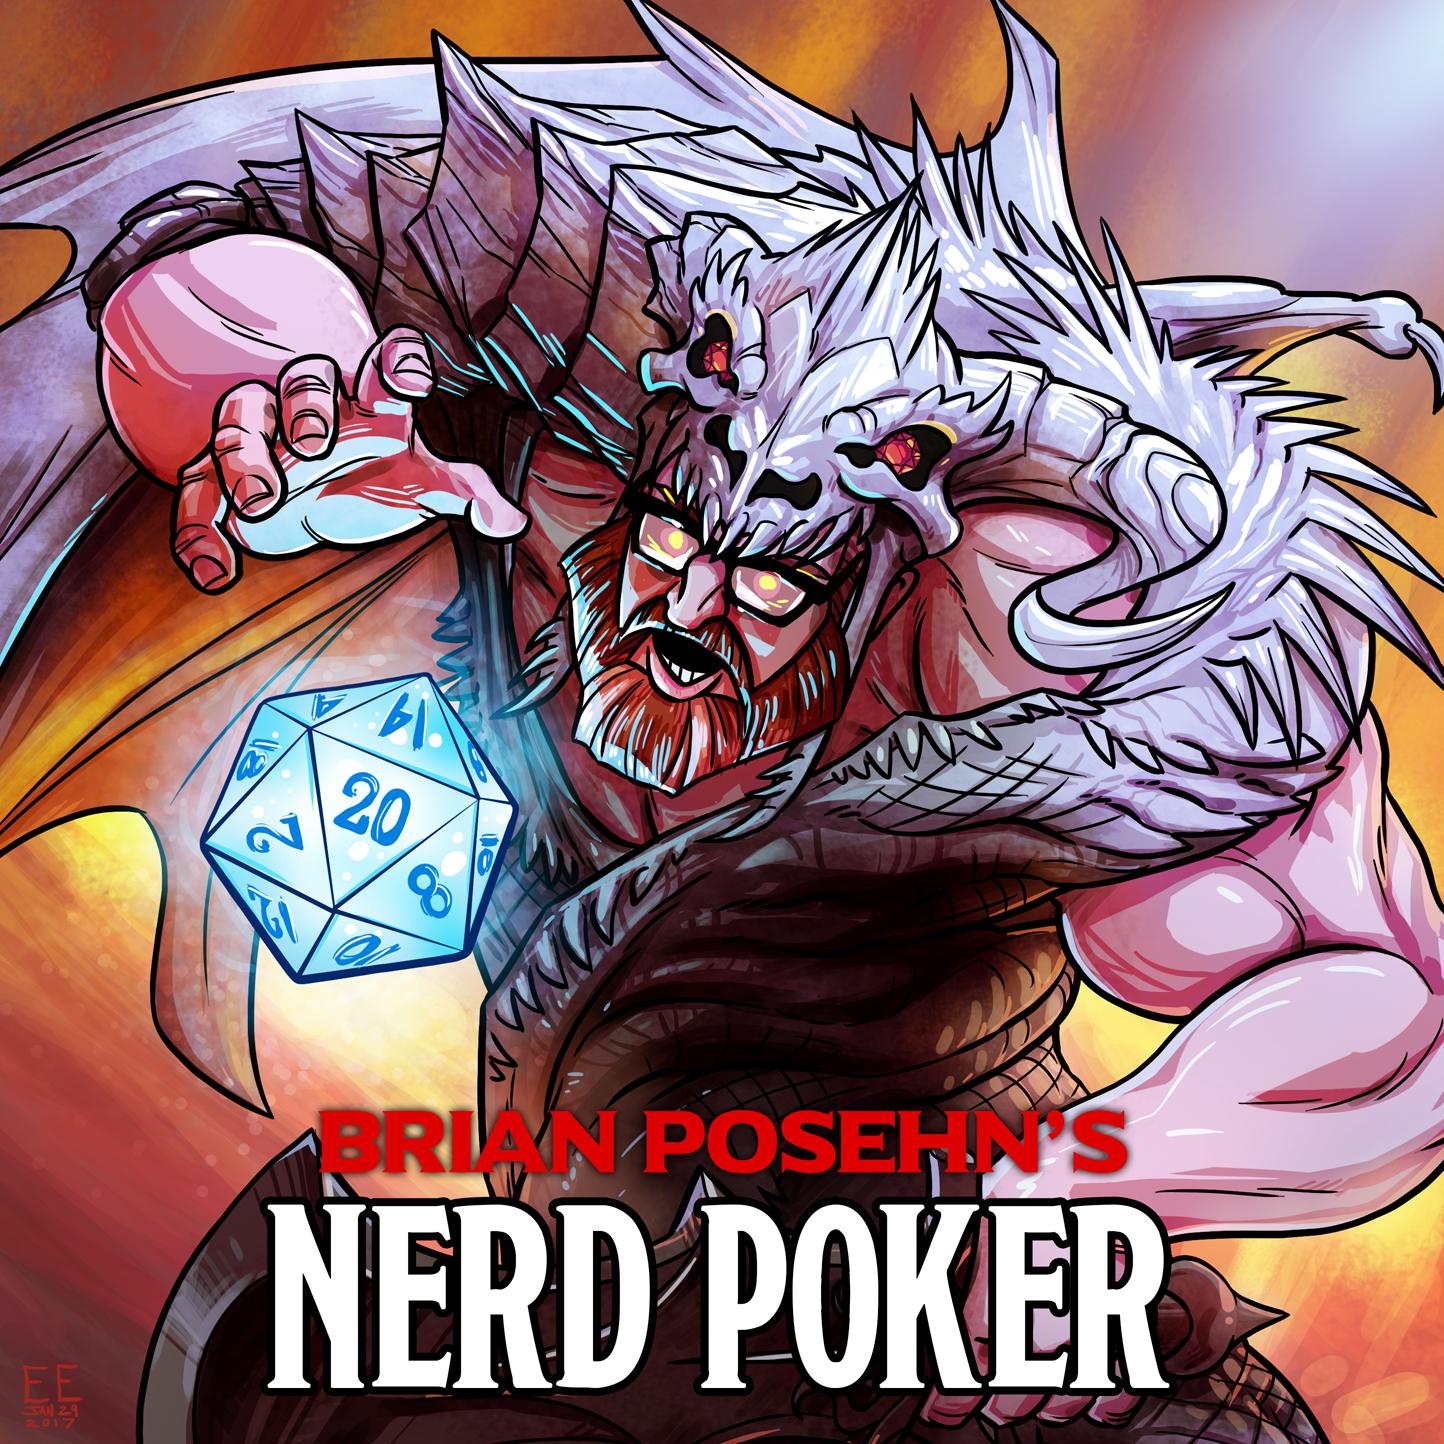 Episode 29 - Wexhall Nerd Poker podcast